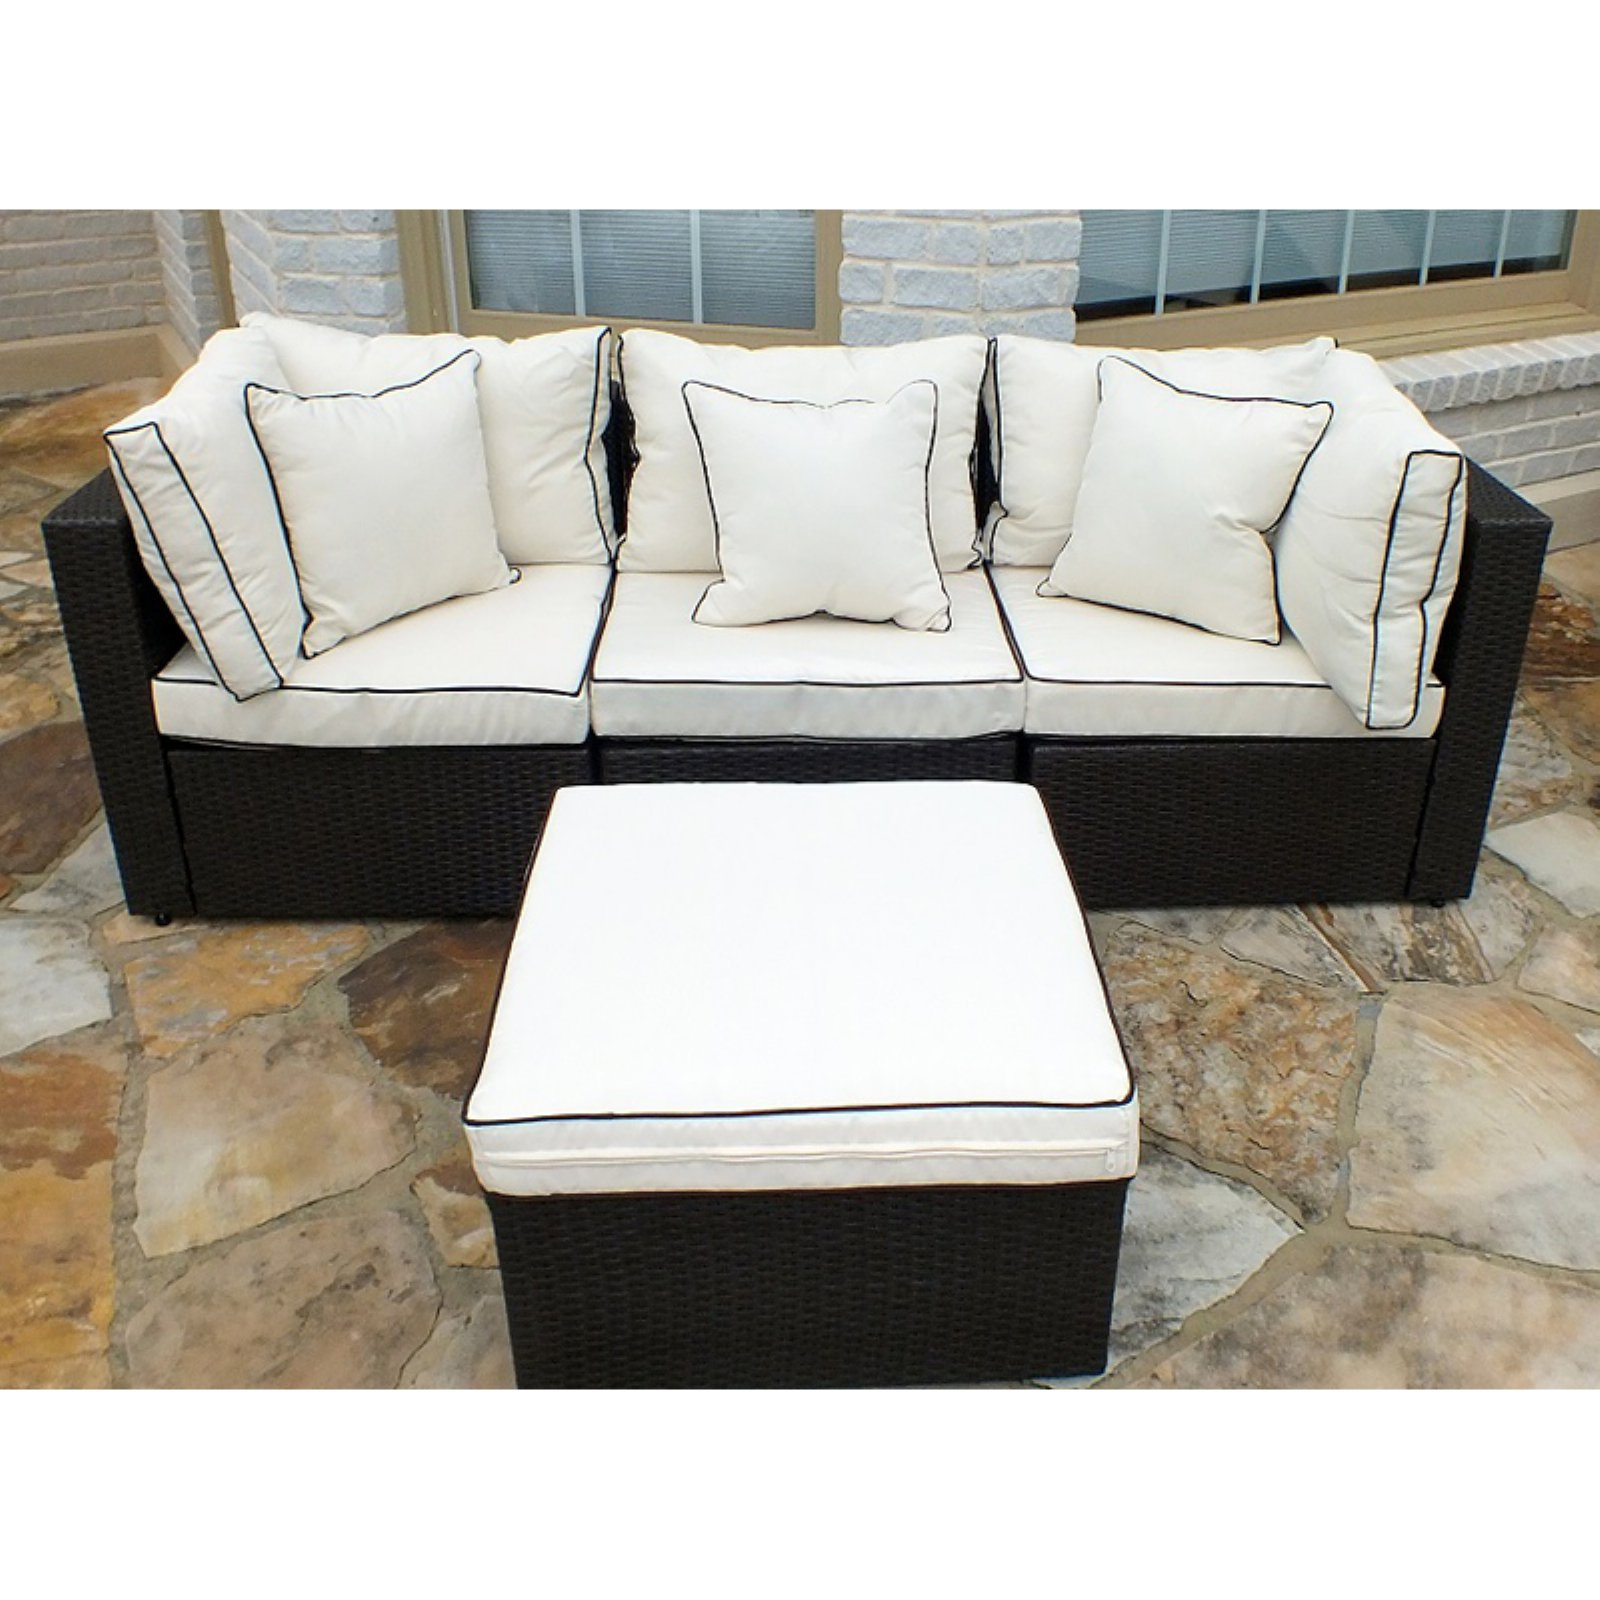 Jj International Hampton Wicker Patio Sofa With Ottoman Regarding Hamptons Sofas (View 8 of 15)